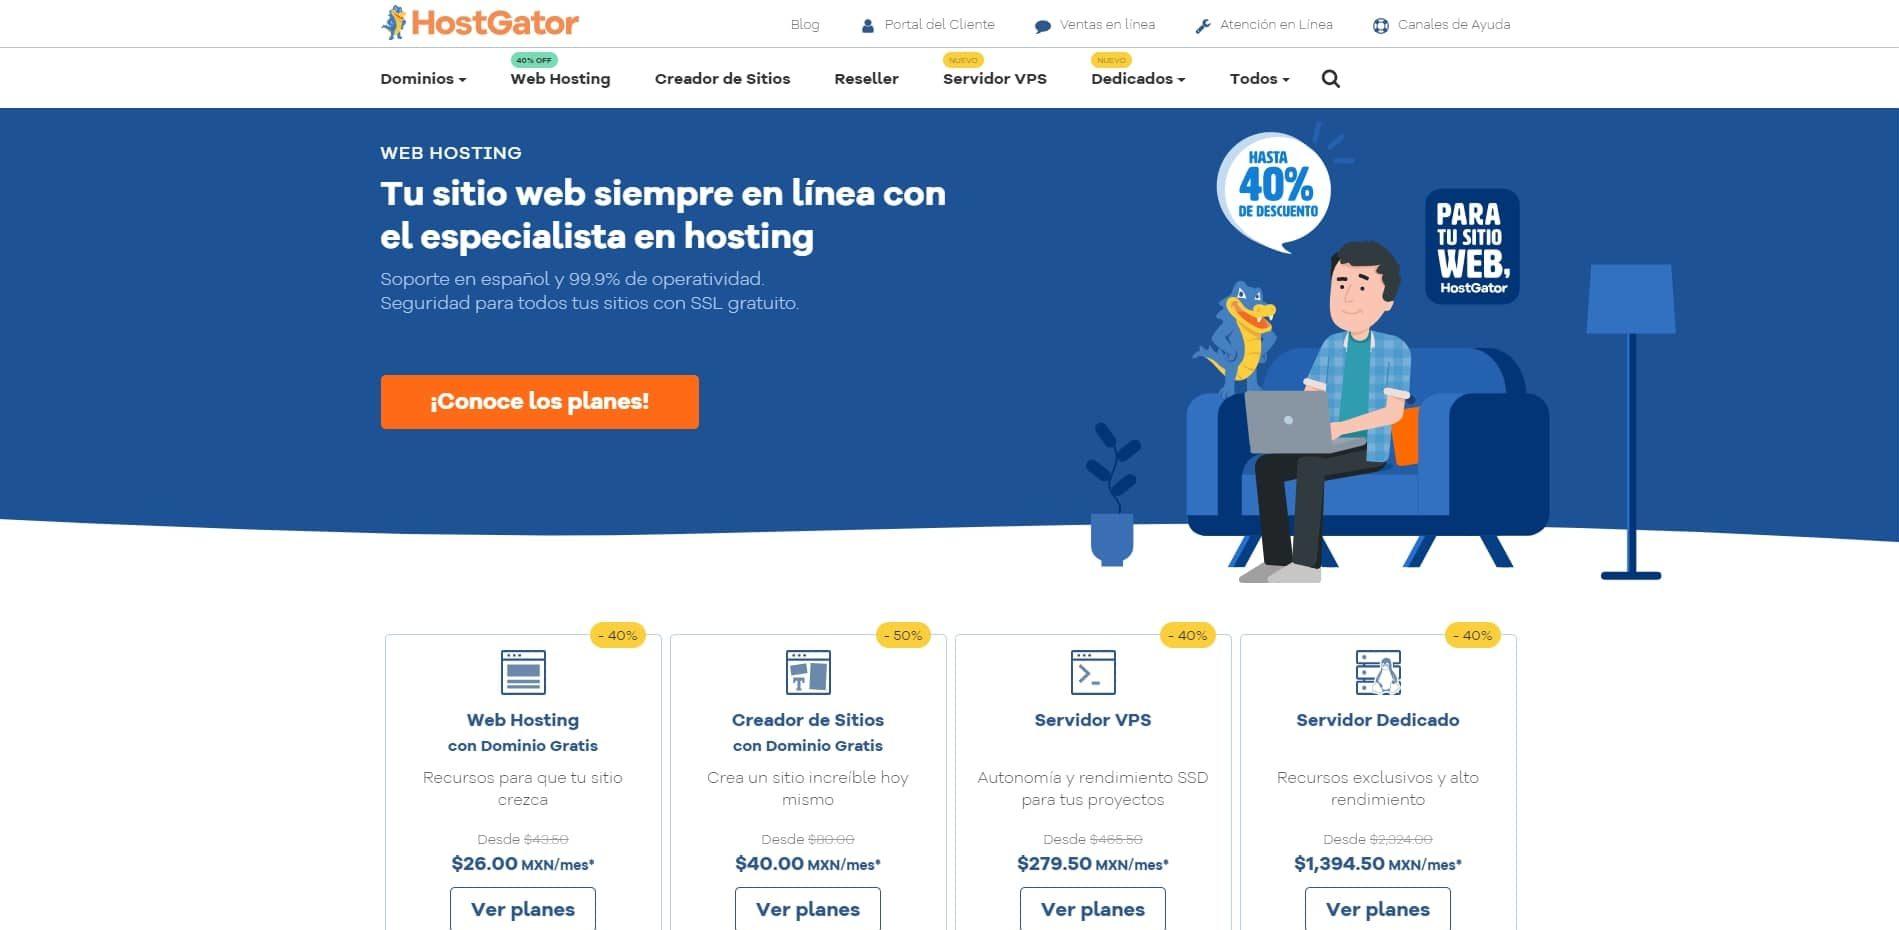 Hostgator web